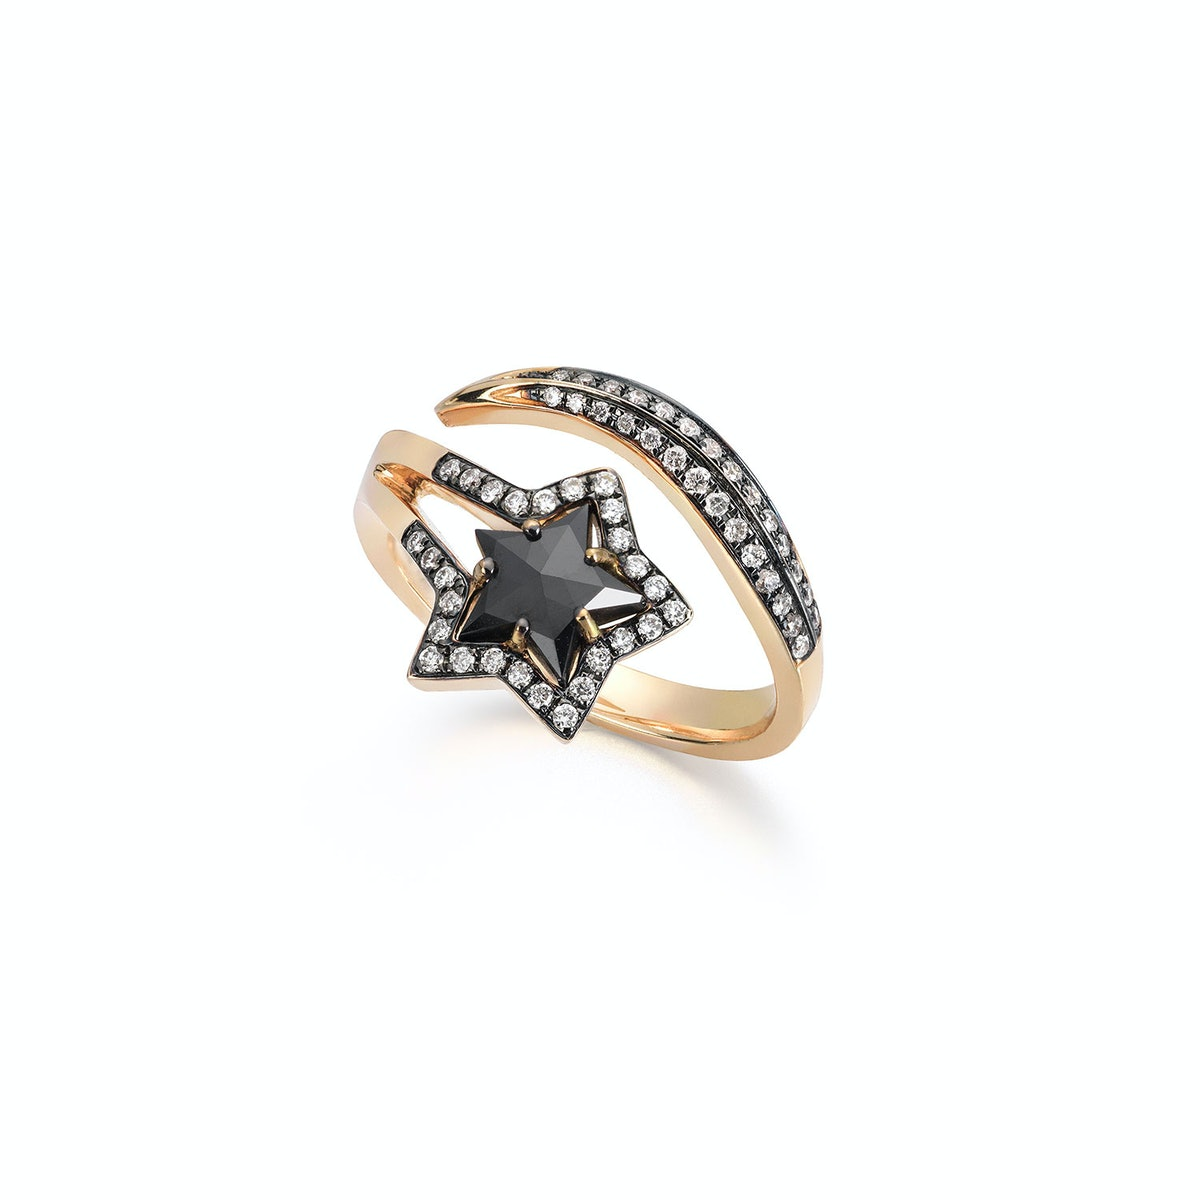 Tomasz Donocik 18k gold, white and black diamond Shooting Star ring